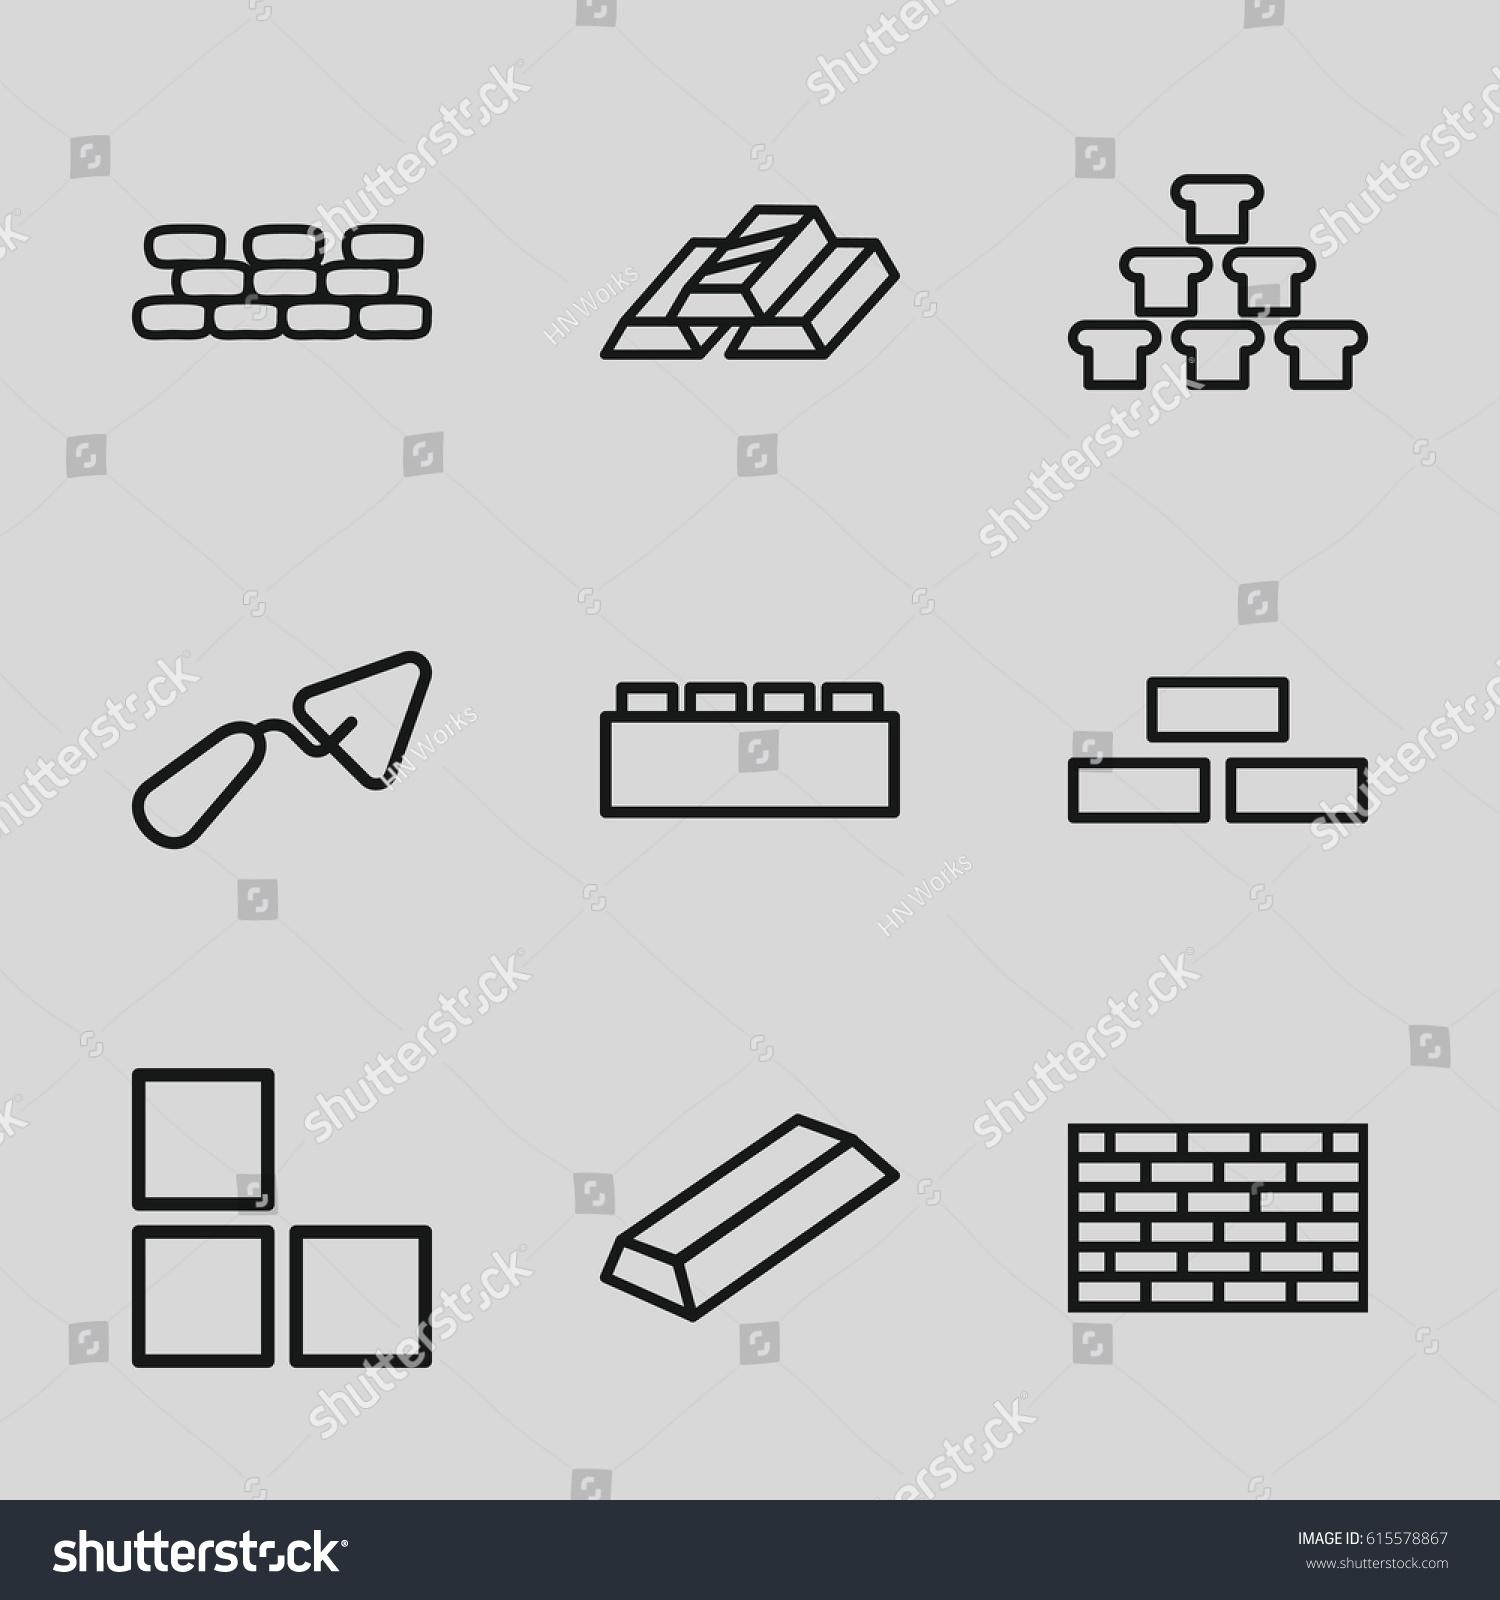 Brick Icons Set Set 9 Brick Stock-Vektorgrafik 615578867 – Shutterstock